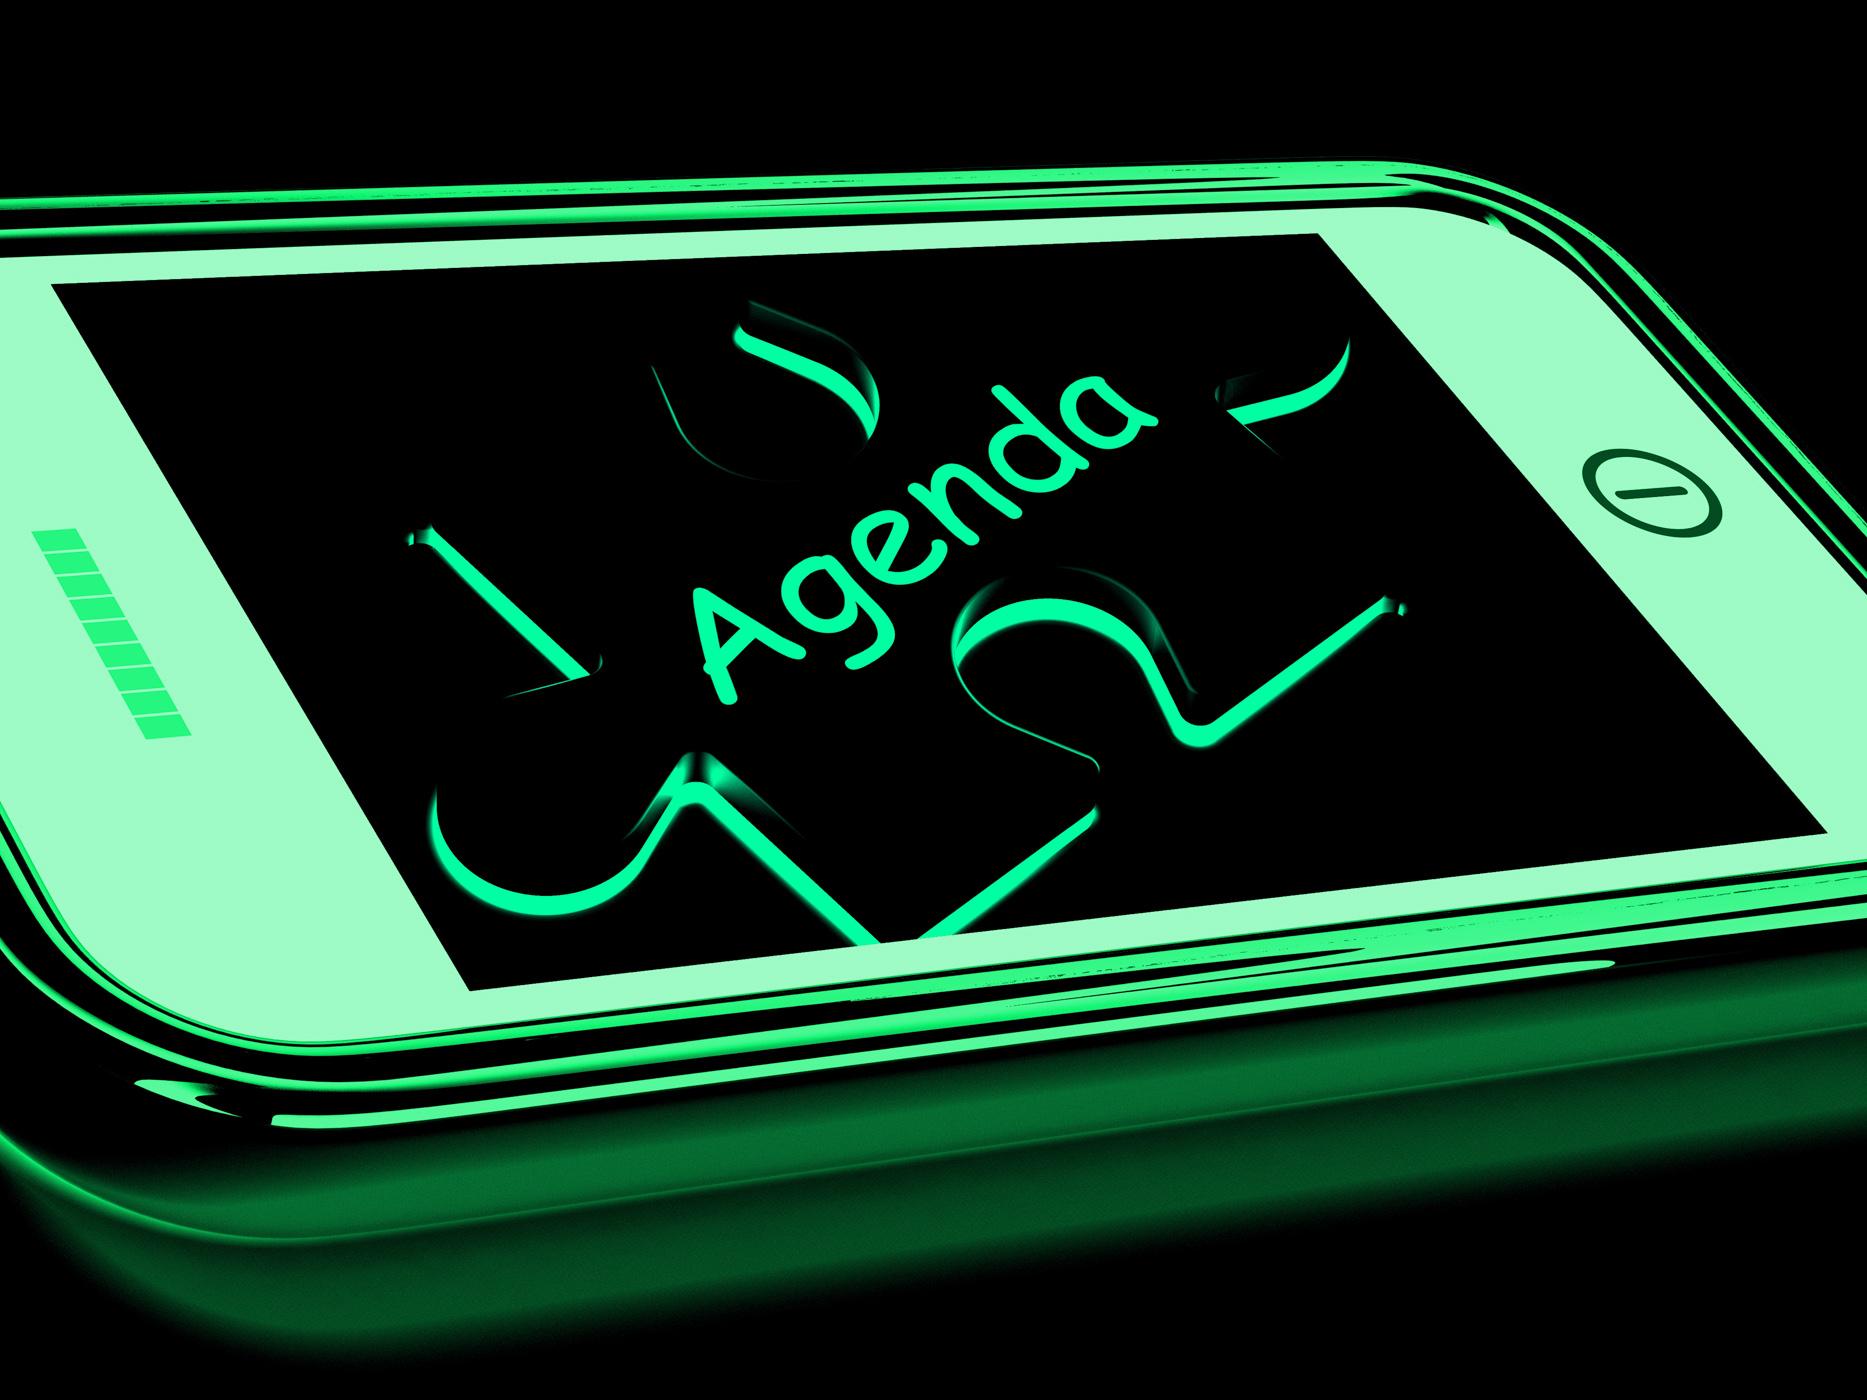 Agenda smartphone shows internet calendar and schedule photo